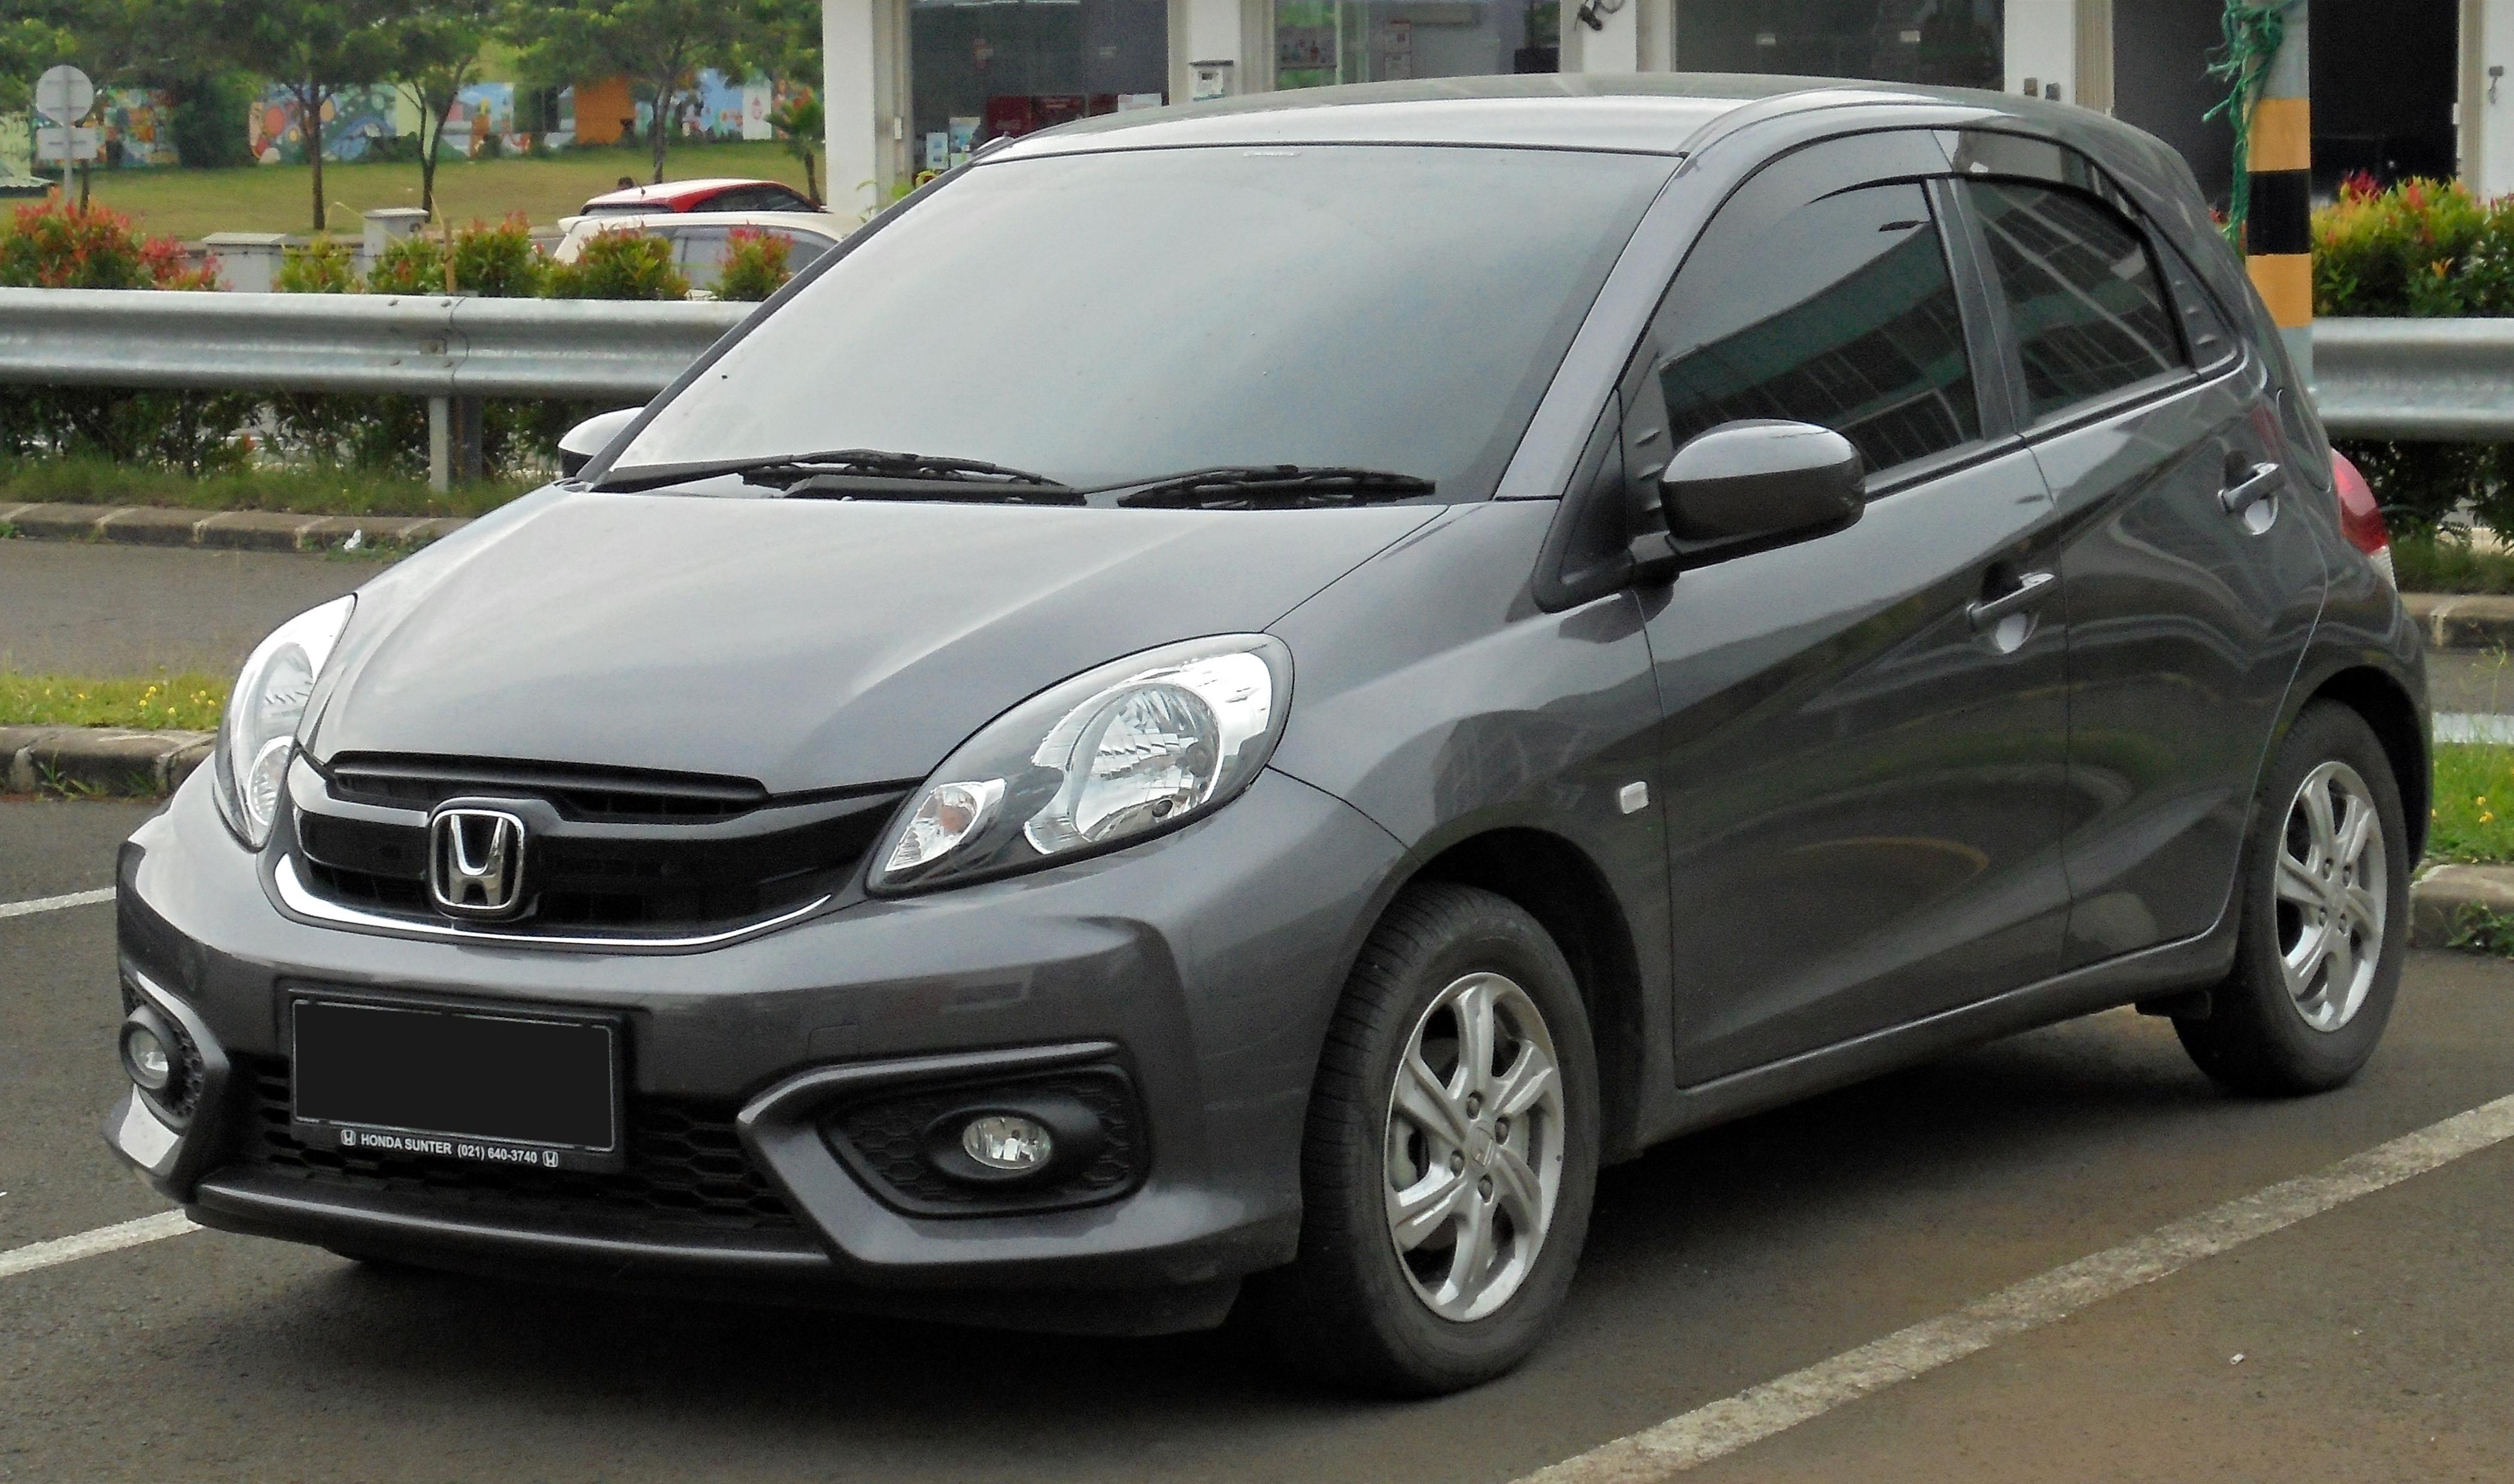 File:2018 Honda Brio Satya 1.2 E hatchback (DD1; 01-31-2019), South Tangerang.jpg - Wikipedia